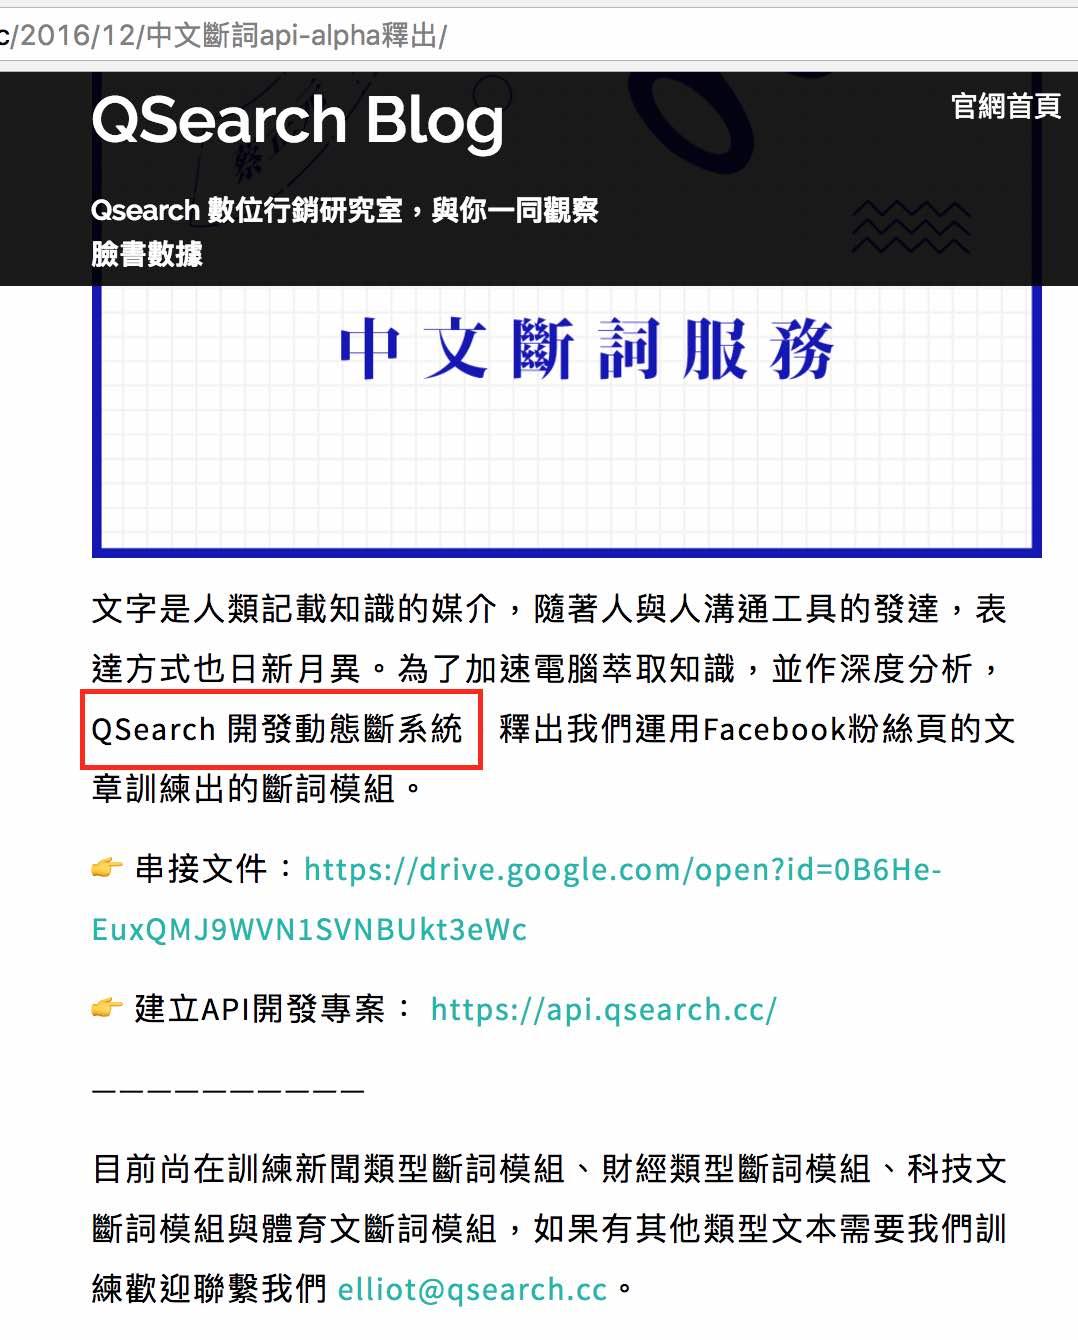 QSearch 免費中文斷詞API – Max的程式語言筆記